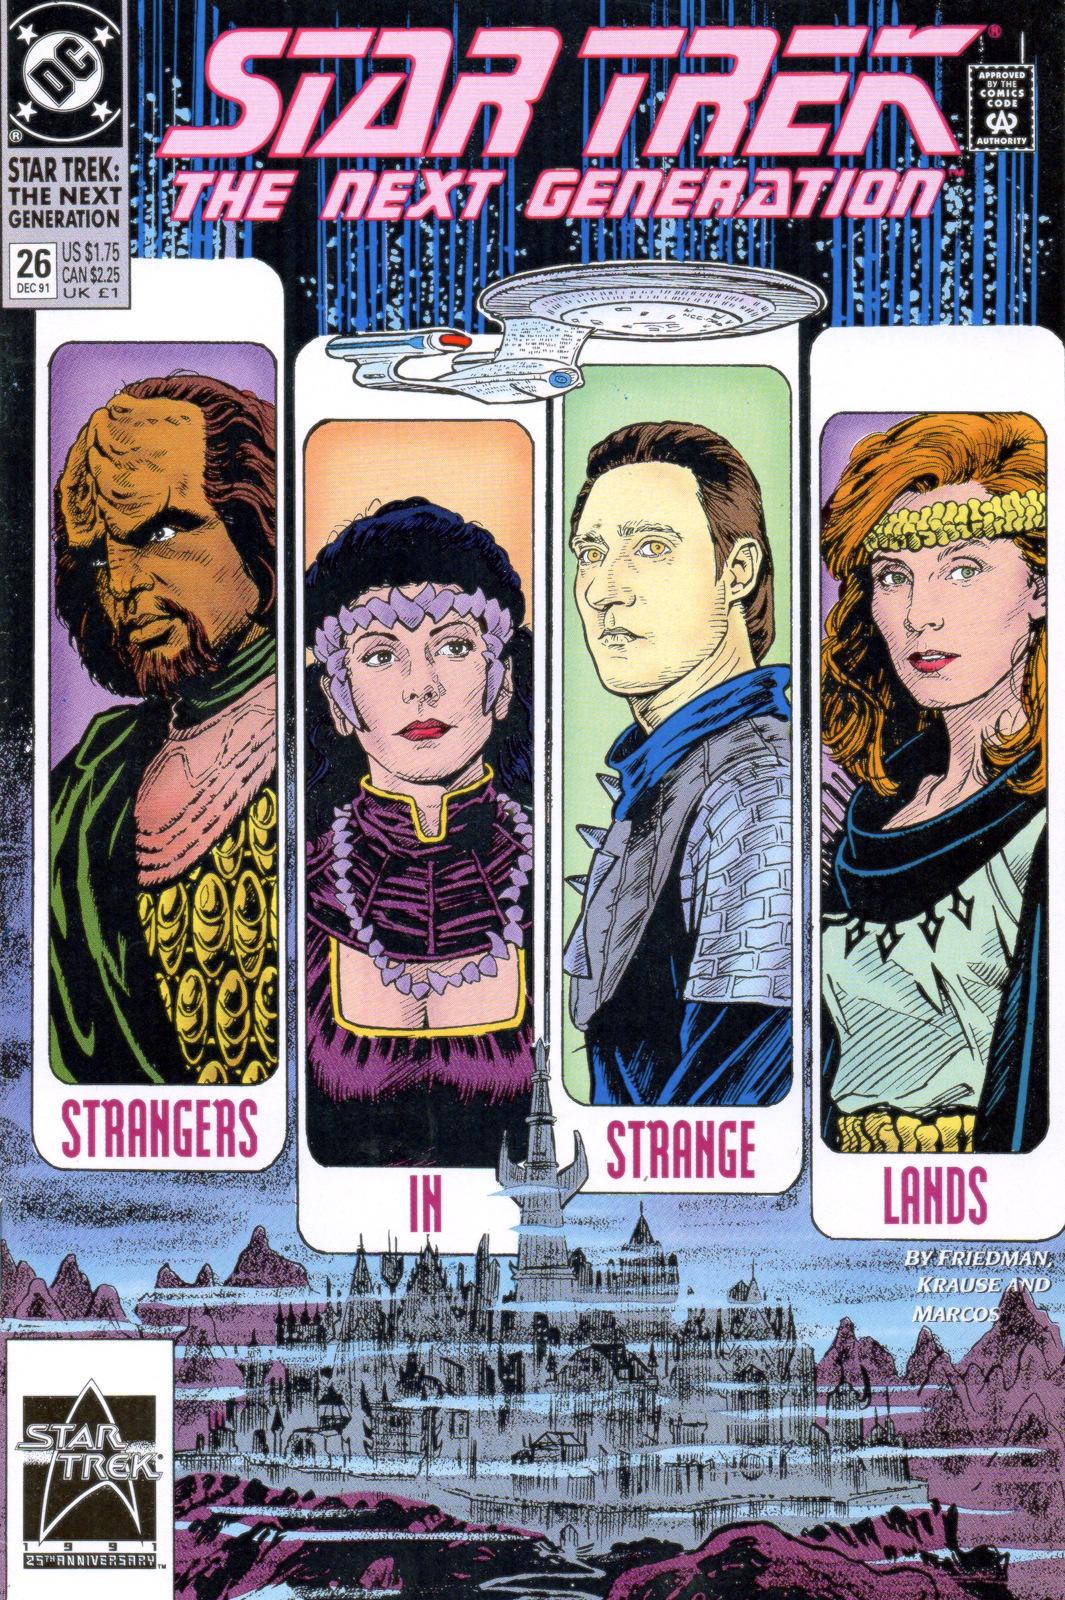 Strangers in Strange Lands!